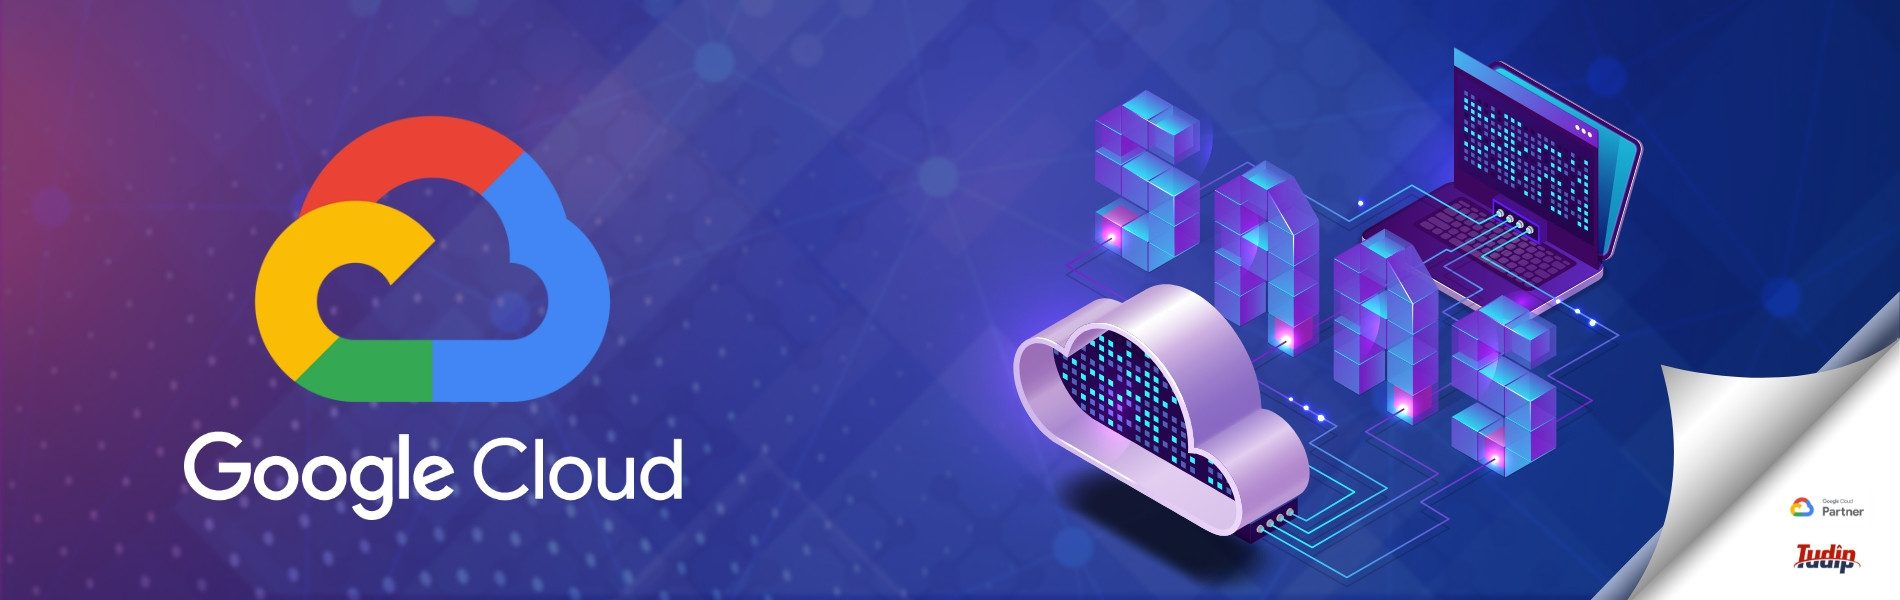 Google Cloud Software as a service (Saas)